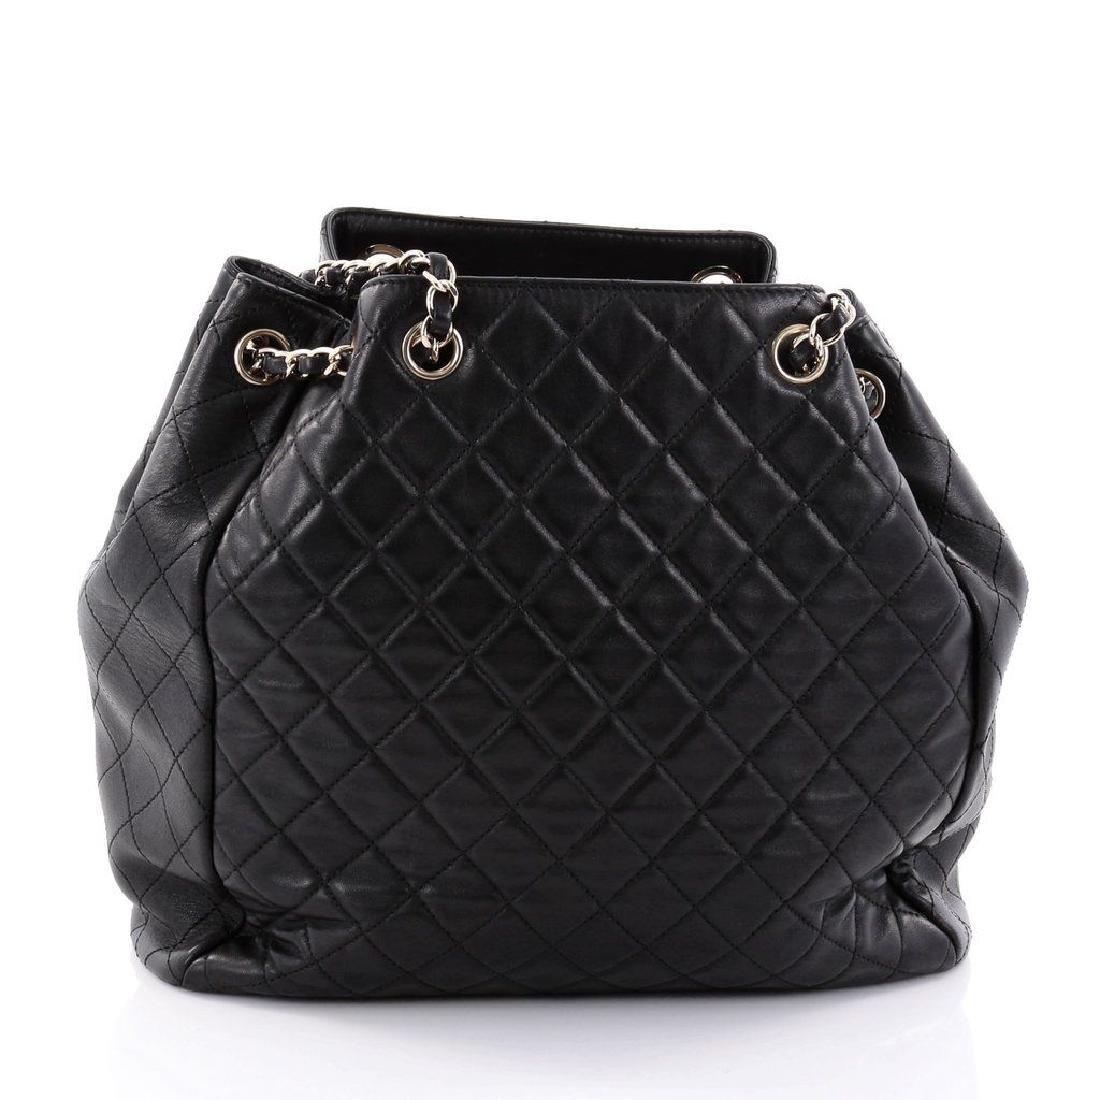 Chanel Lambskin Classic CC Drawstring Black Bucket Bag - 3